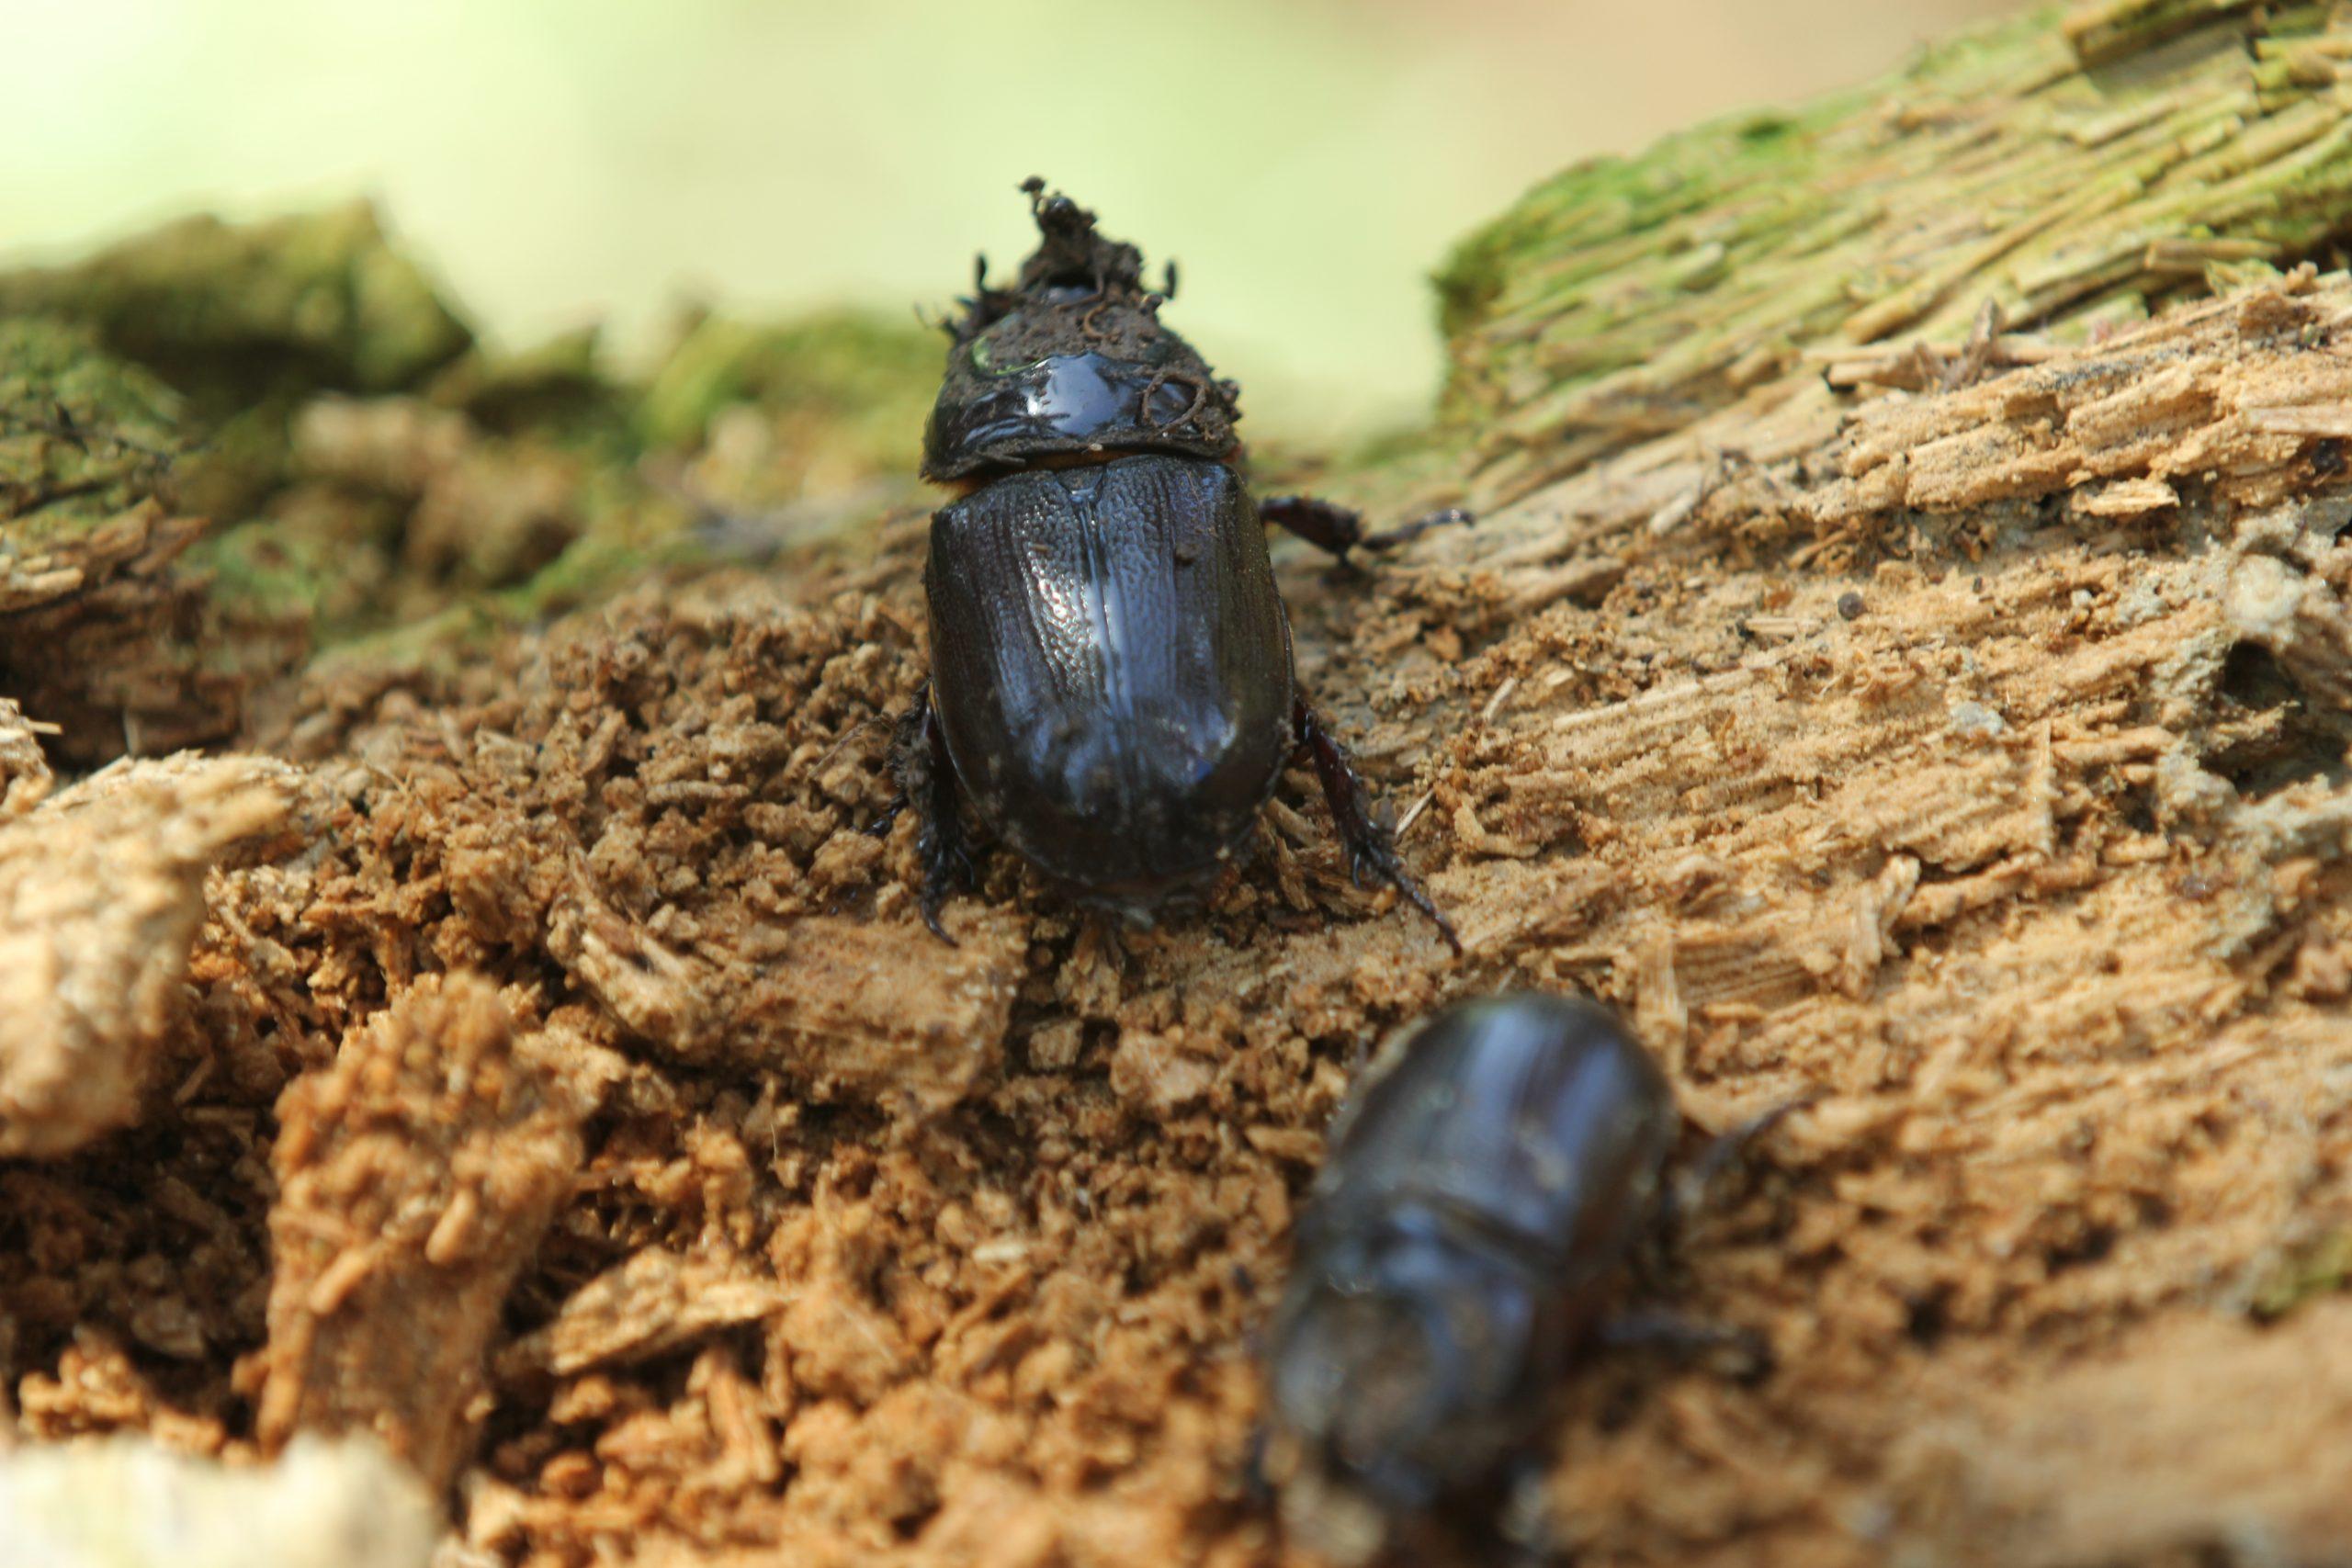 Pengendalian Kumbang Tanduk Gunakan Beragam Teknik - Majalah Sawit Indonesia